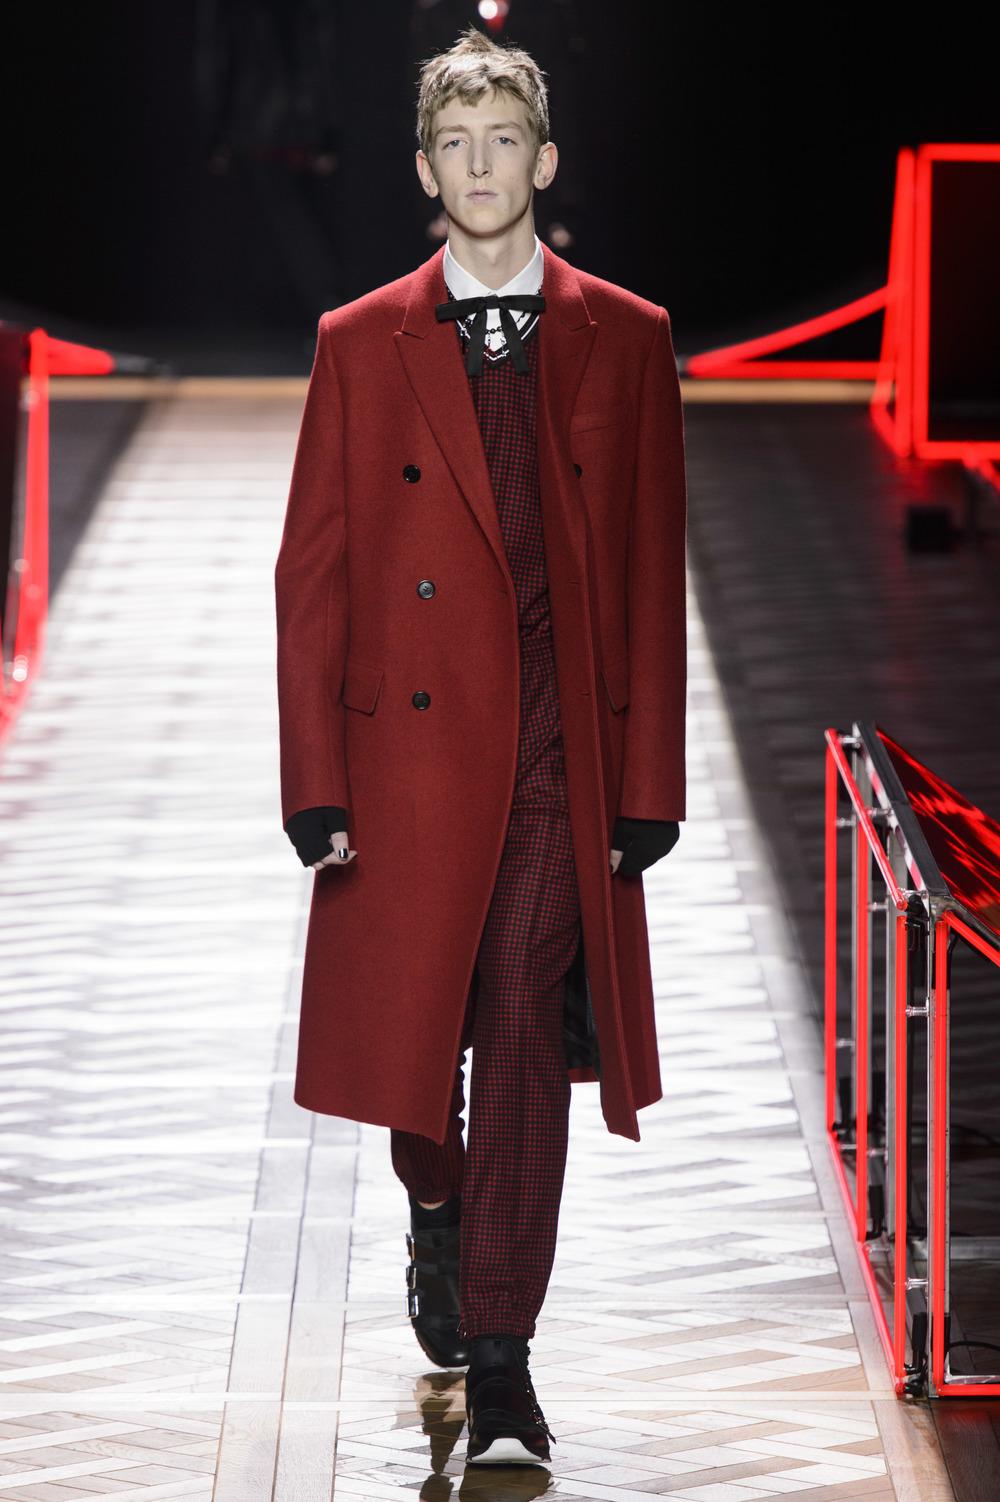 Dior_Homme_Hiver2016-17_look_19.JPG